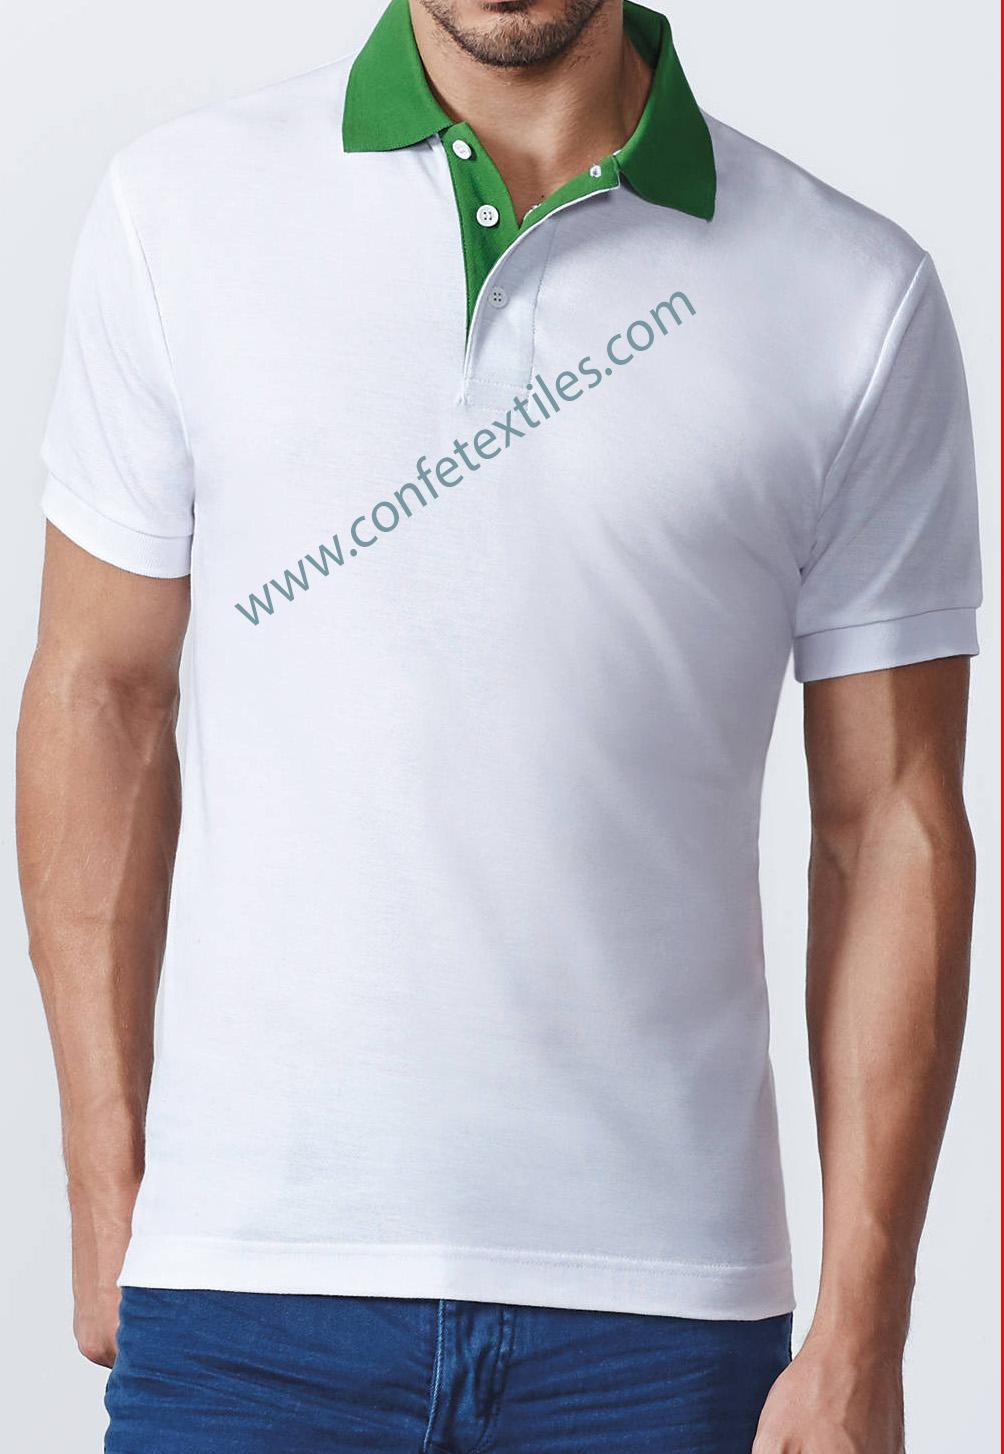 polo camisero combinacion blanco con verde